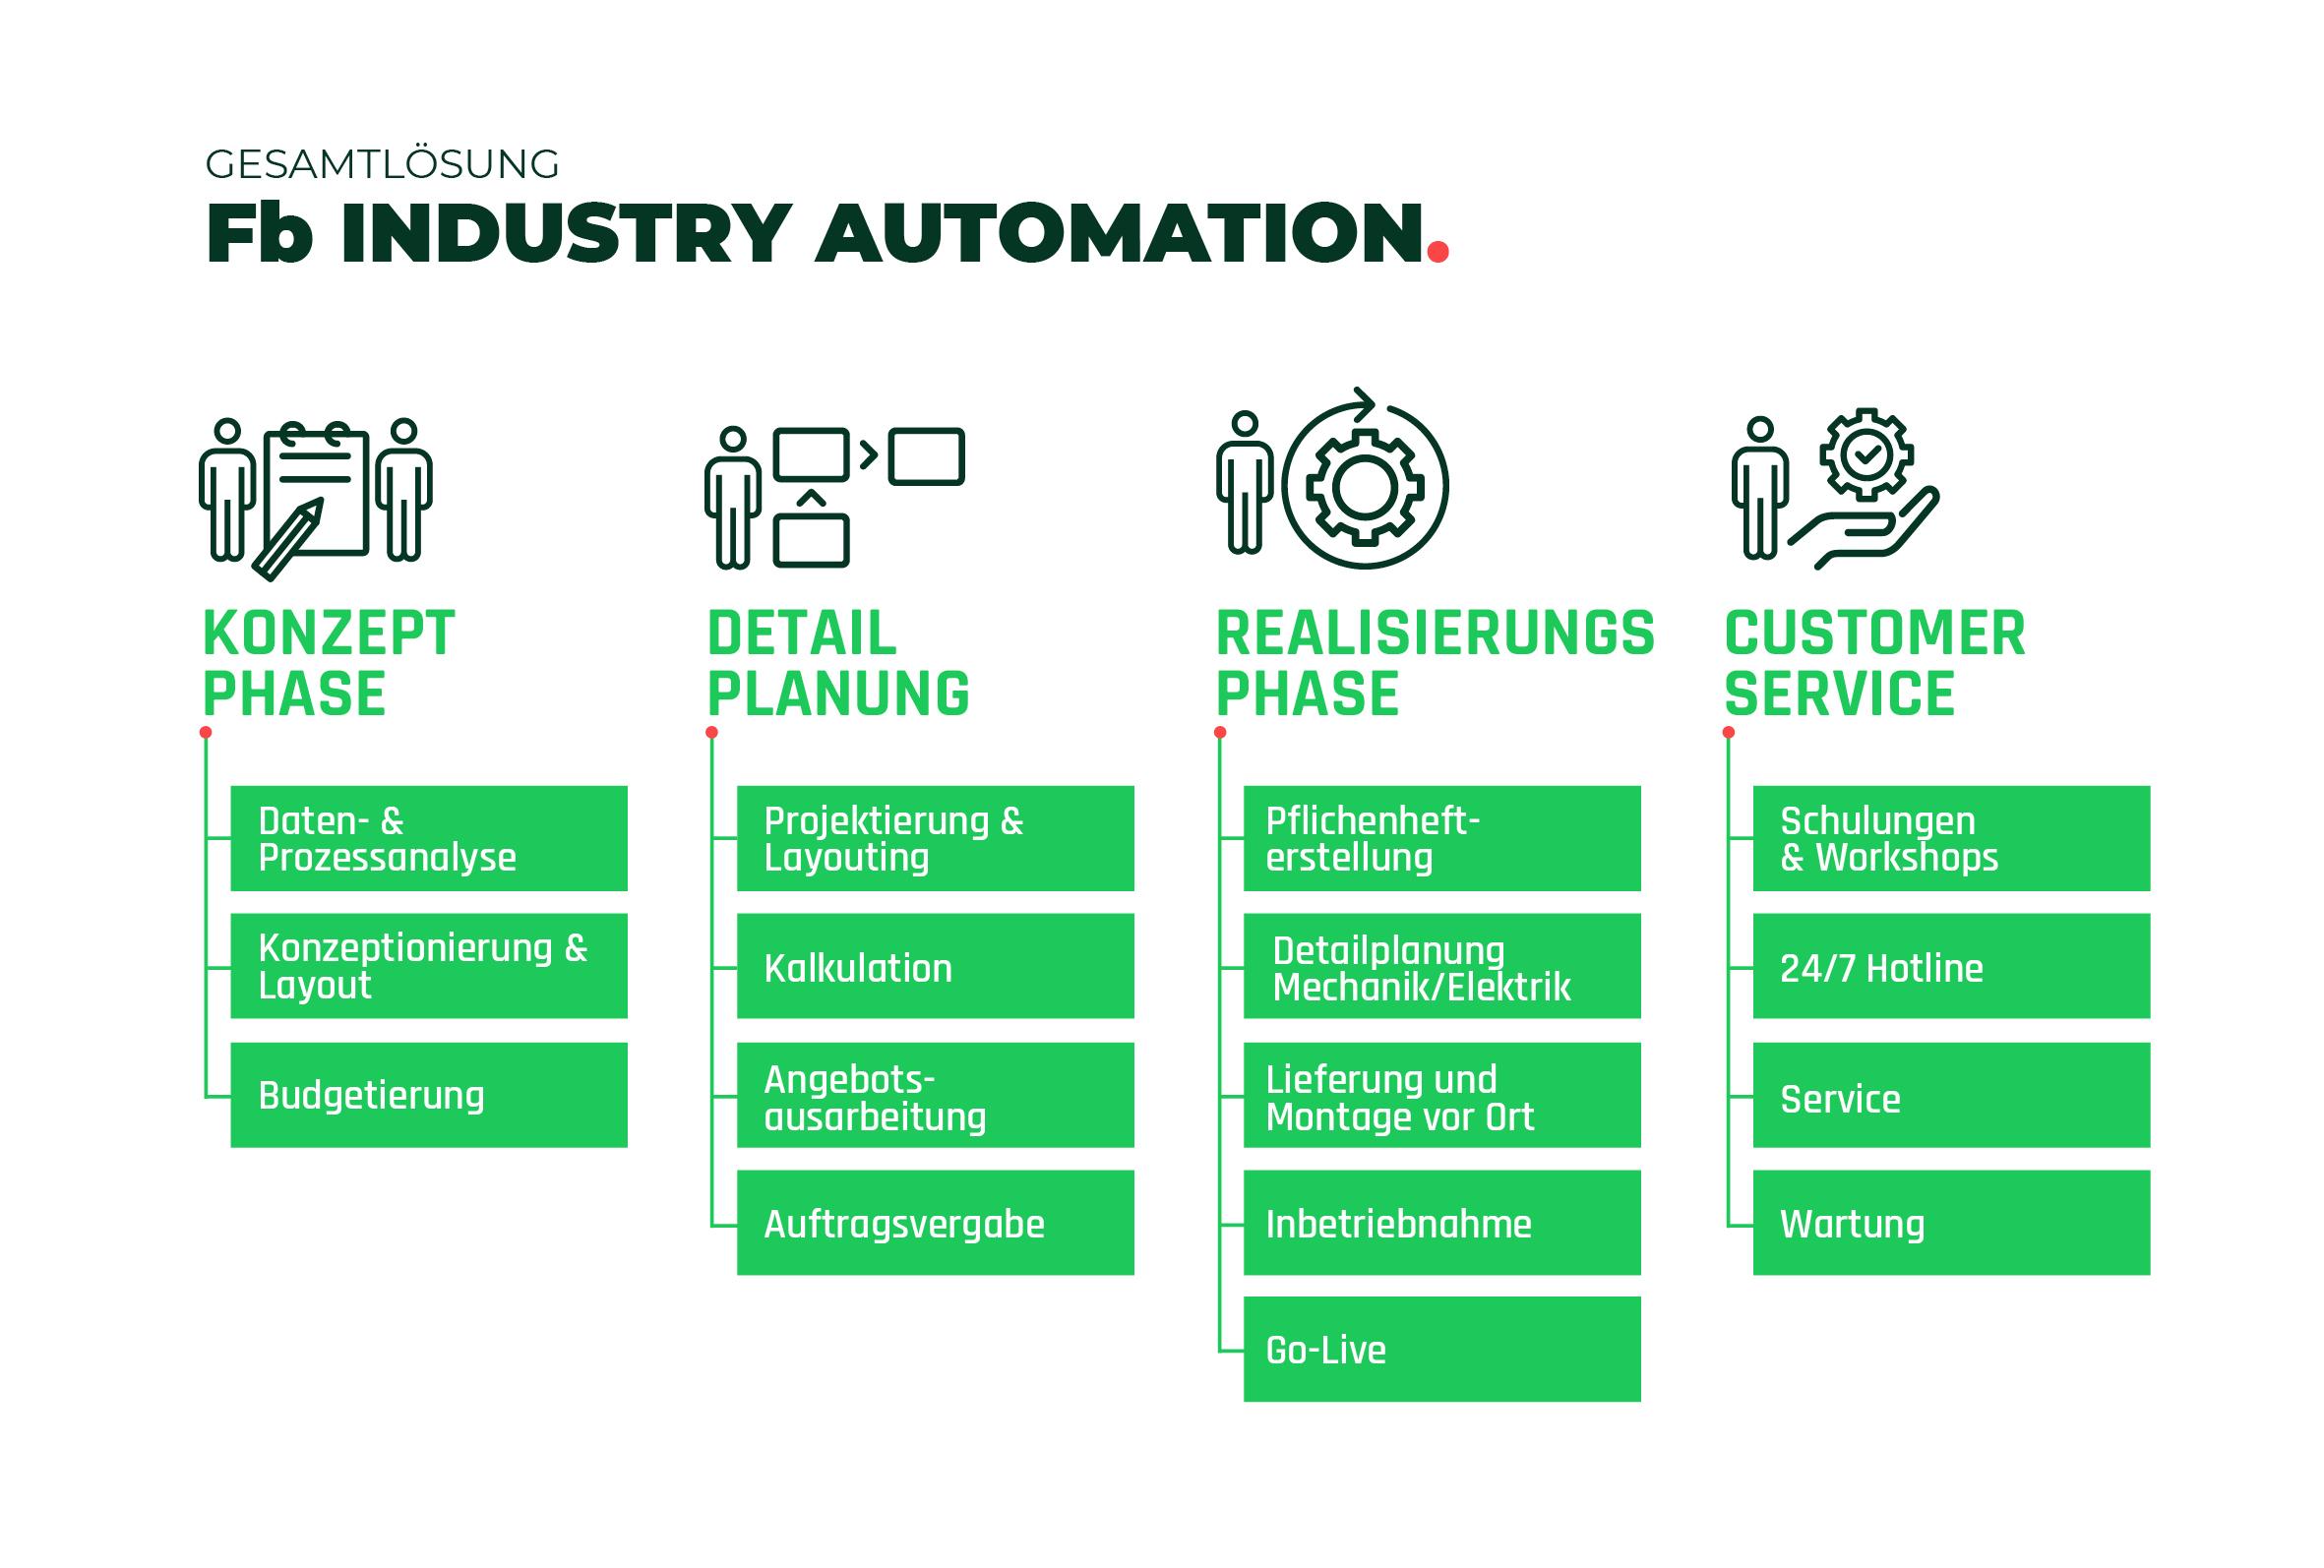 360+projektbegleitung-phasenaufbau-erstanalyse-umsetzung-service-fb-industry-automation